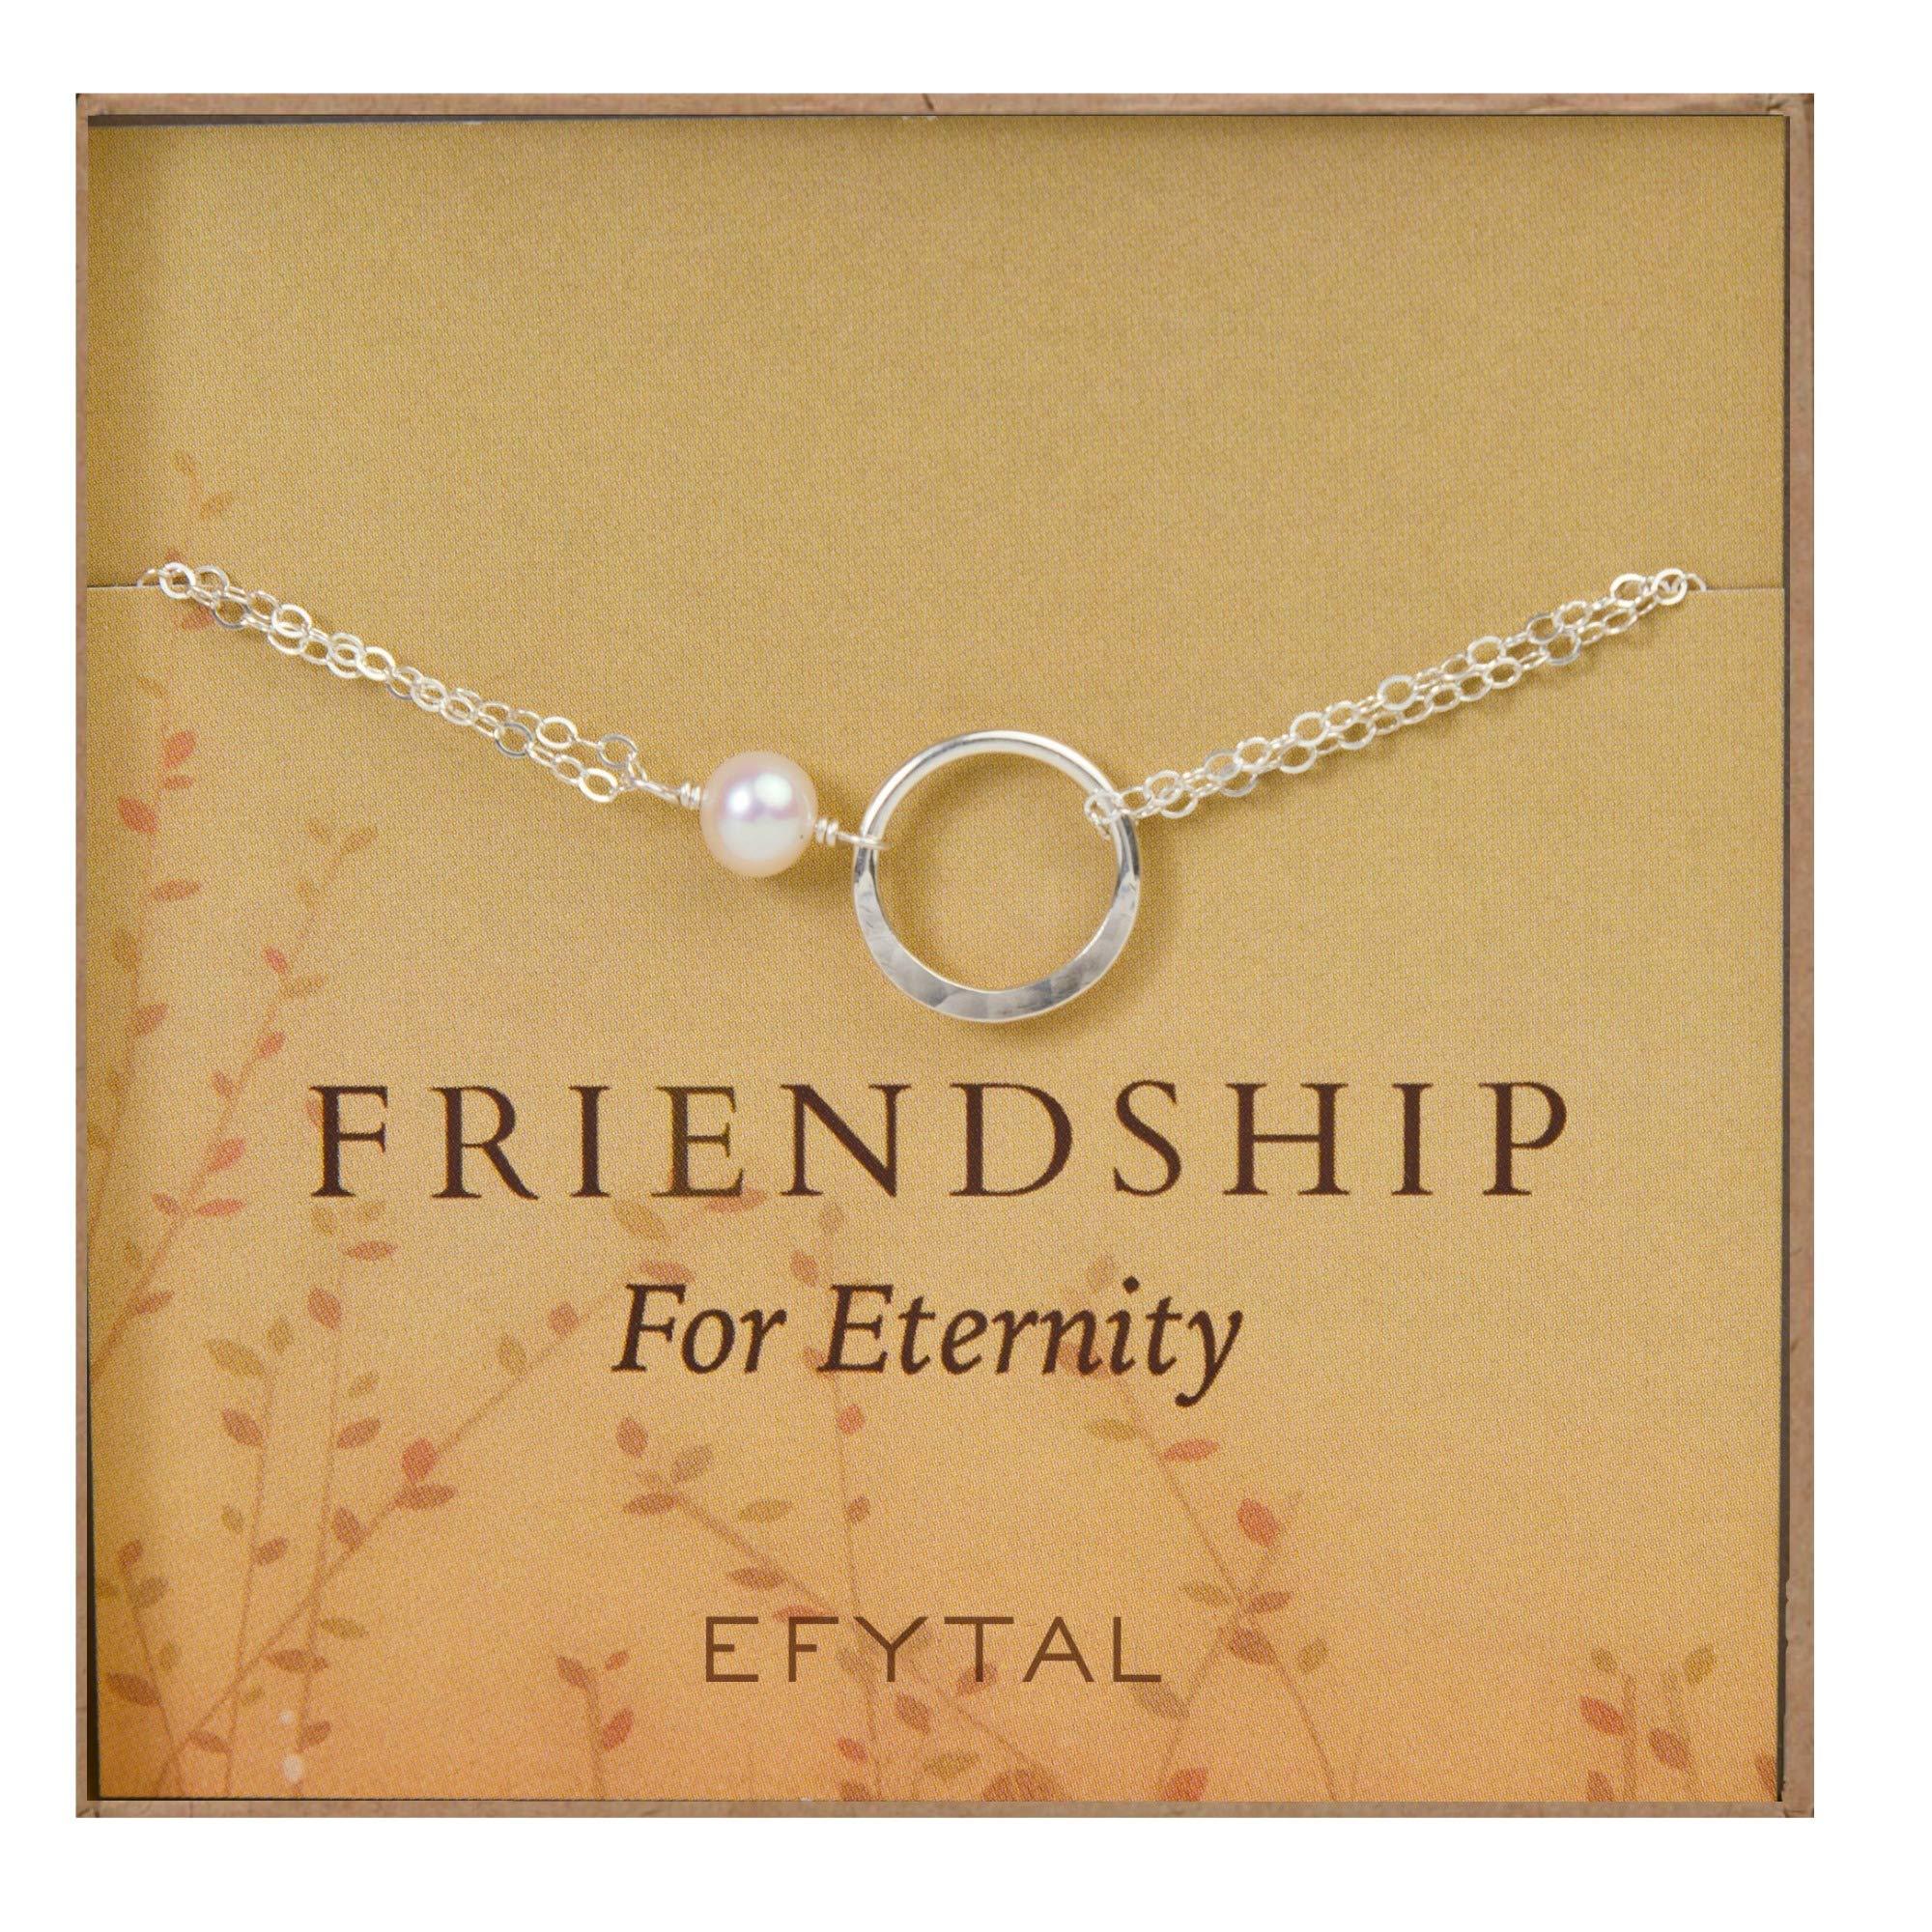 EFYTAL Friendship Bracelet, Sterling Silver Eternity Karma Circle with Cultured Pearl by EFYTAL